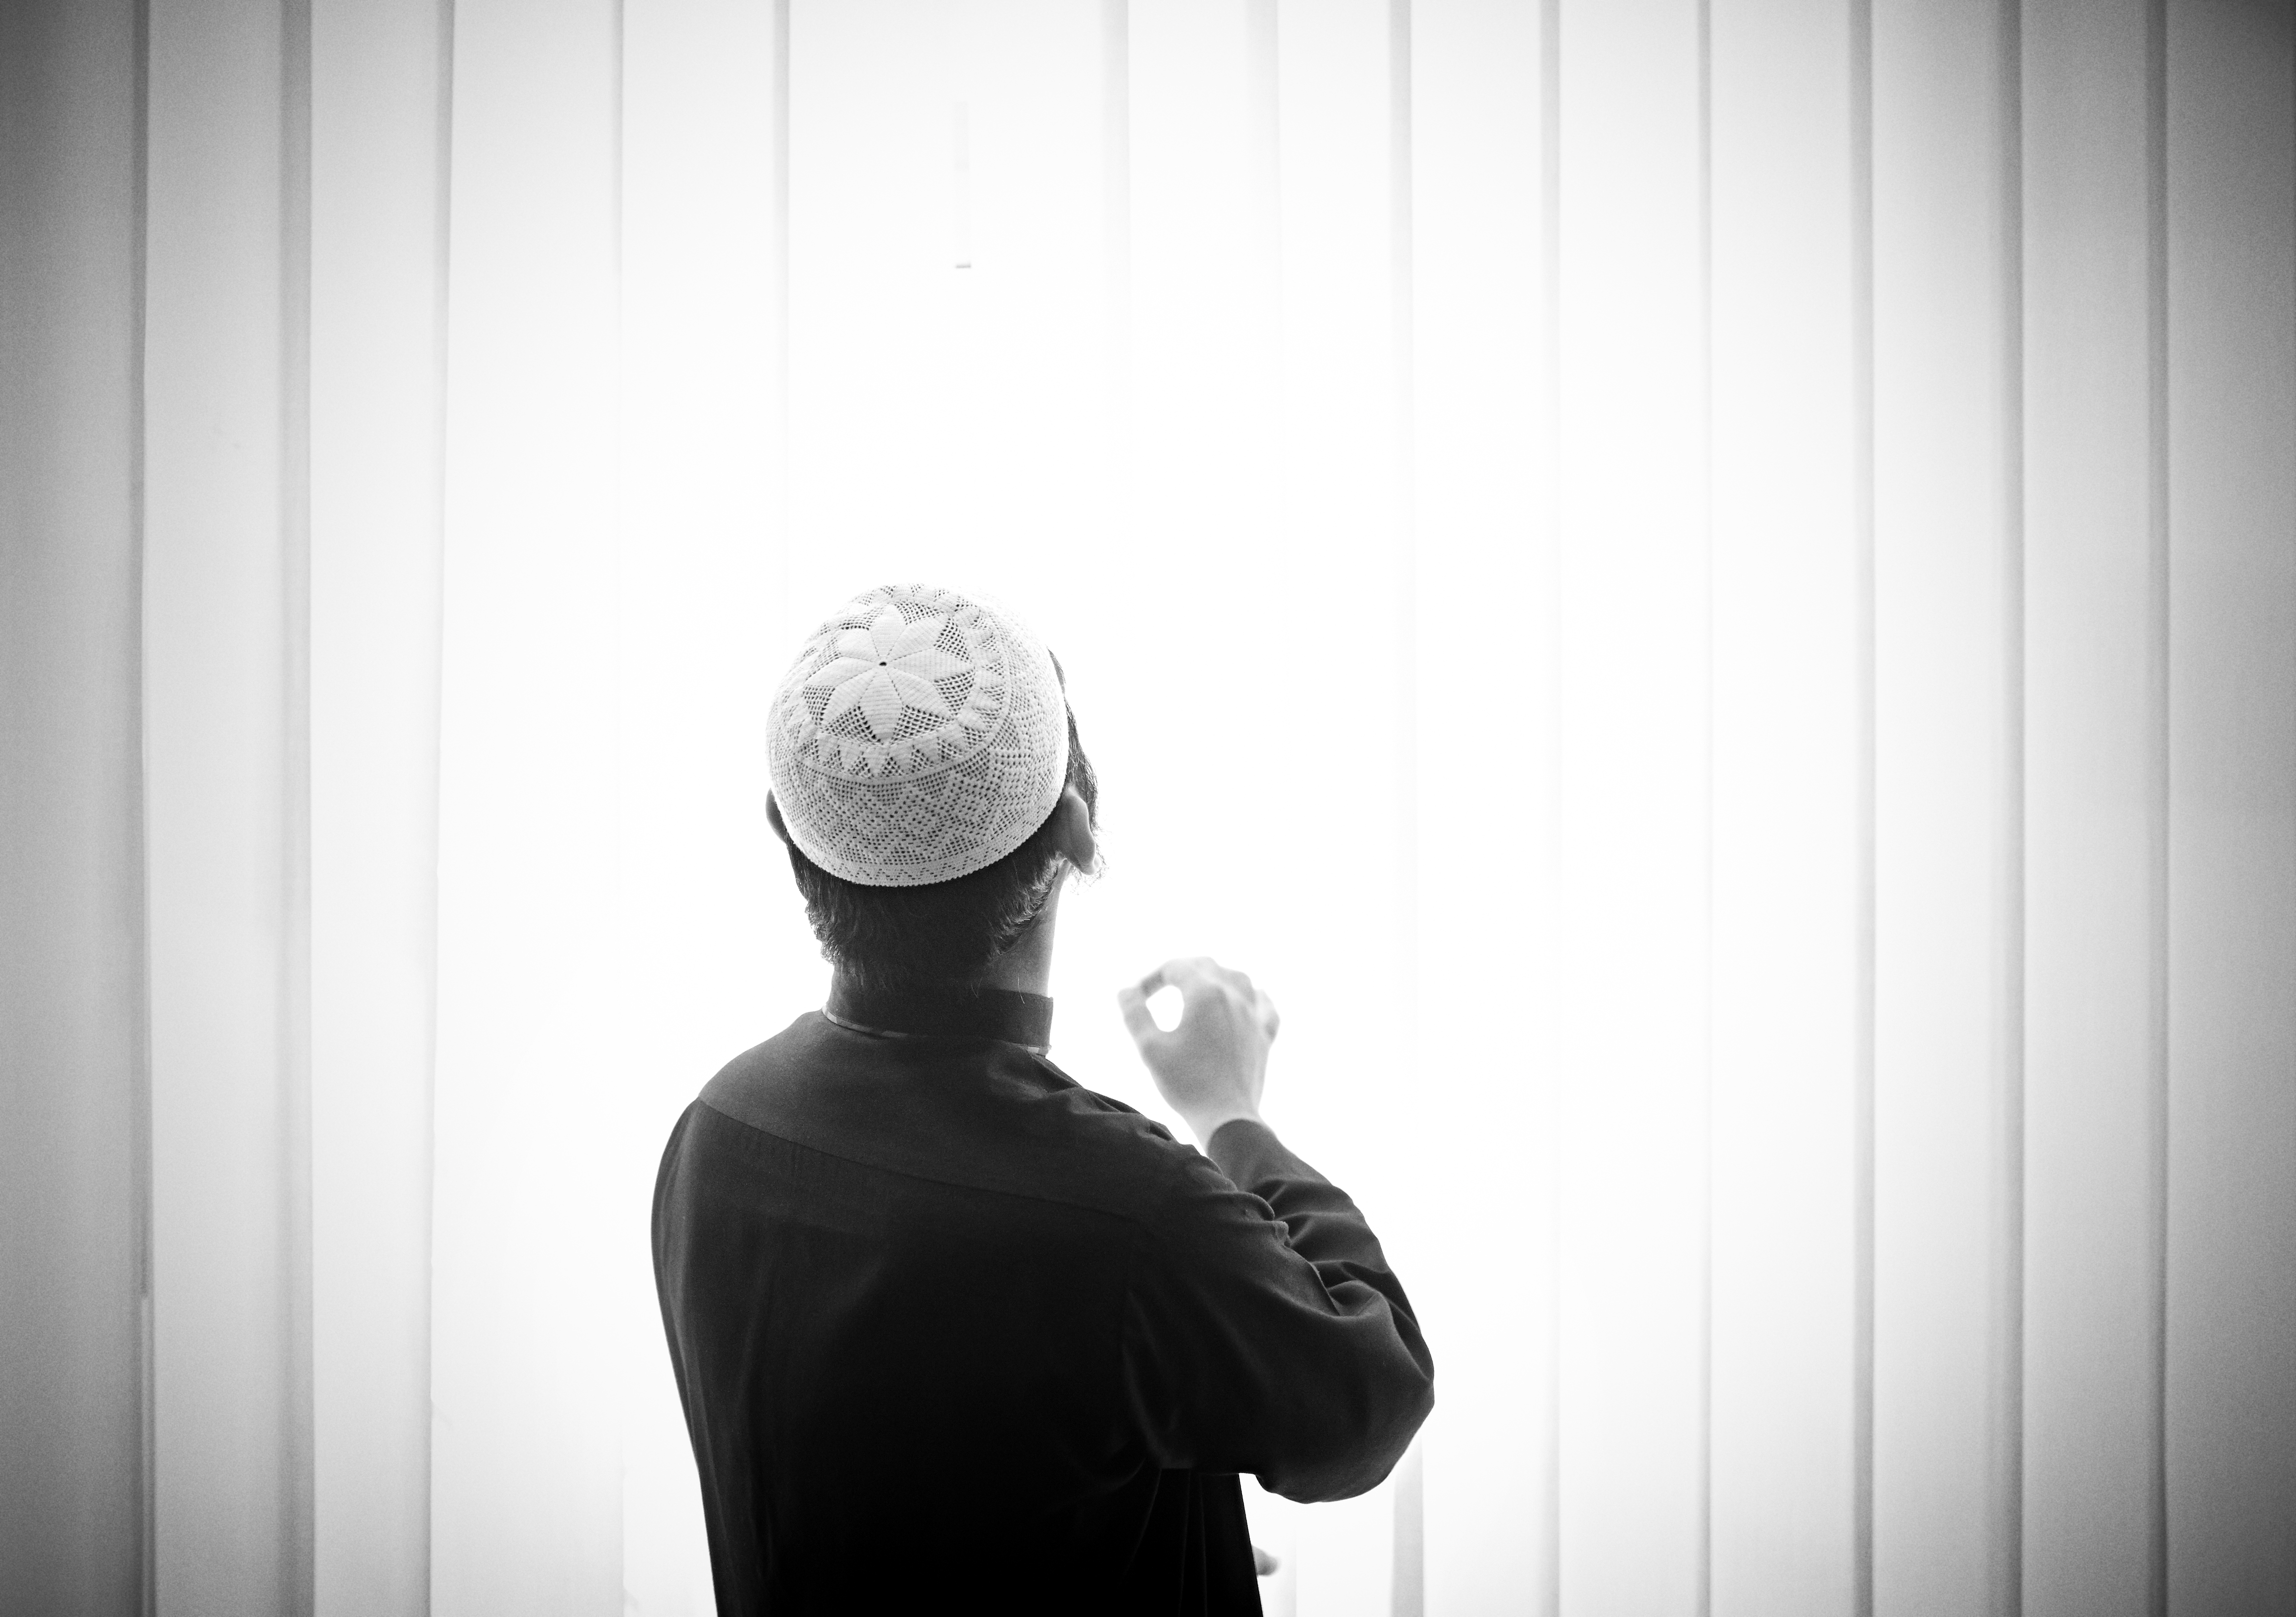 imam Hamid Ali Farooq